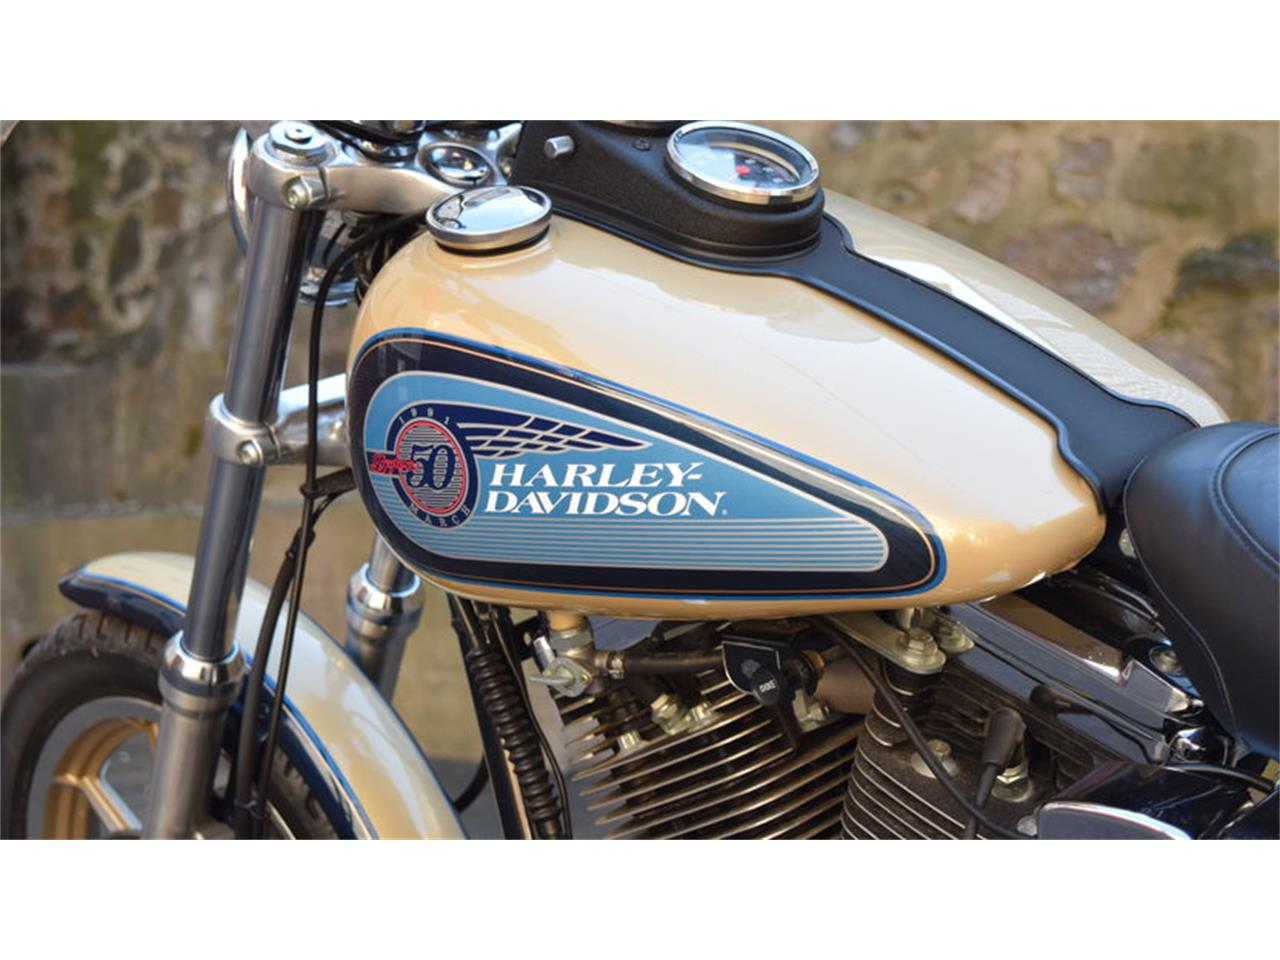 1992 Harley-Davidson Daytona for Sale | ClassicCars com | CC-929591